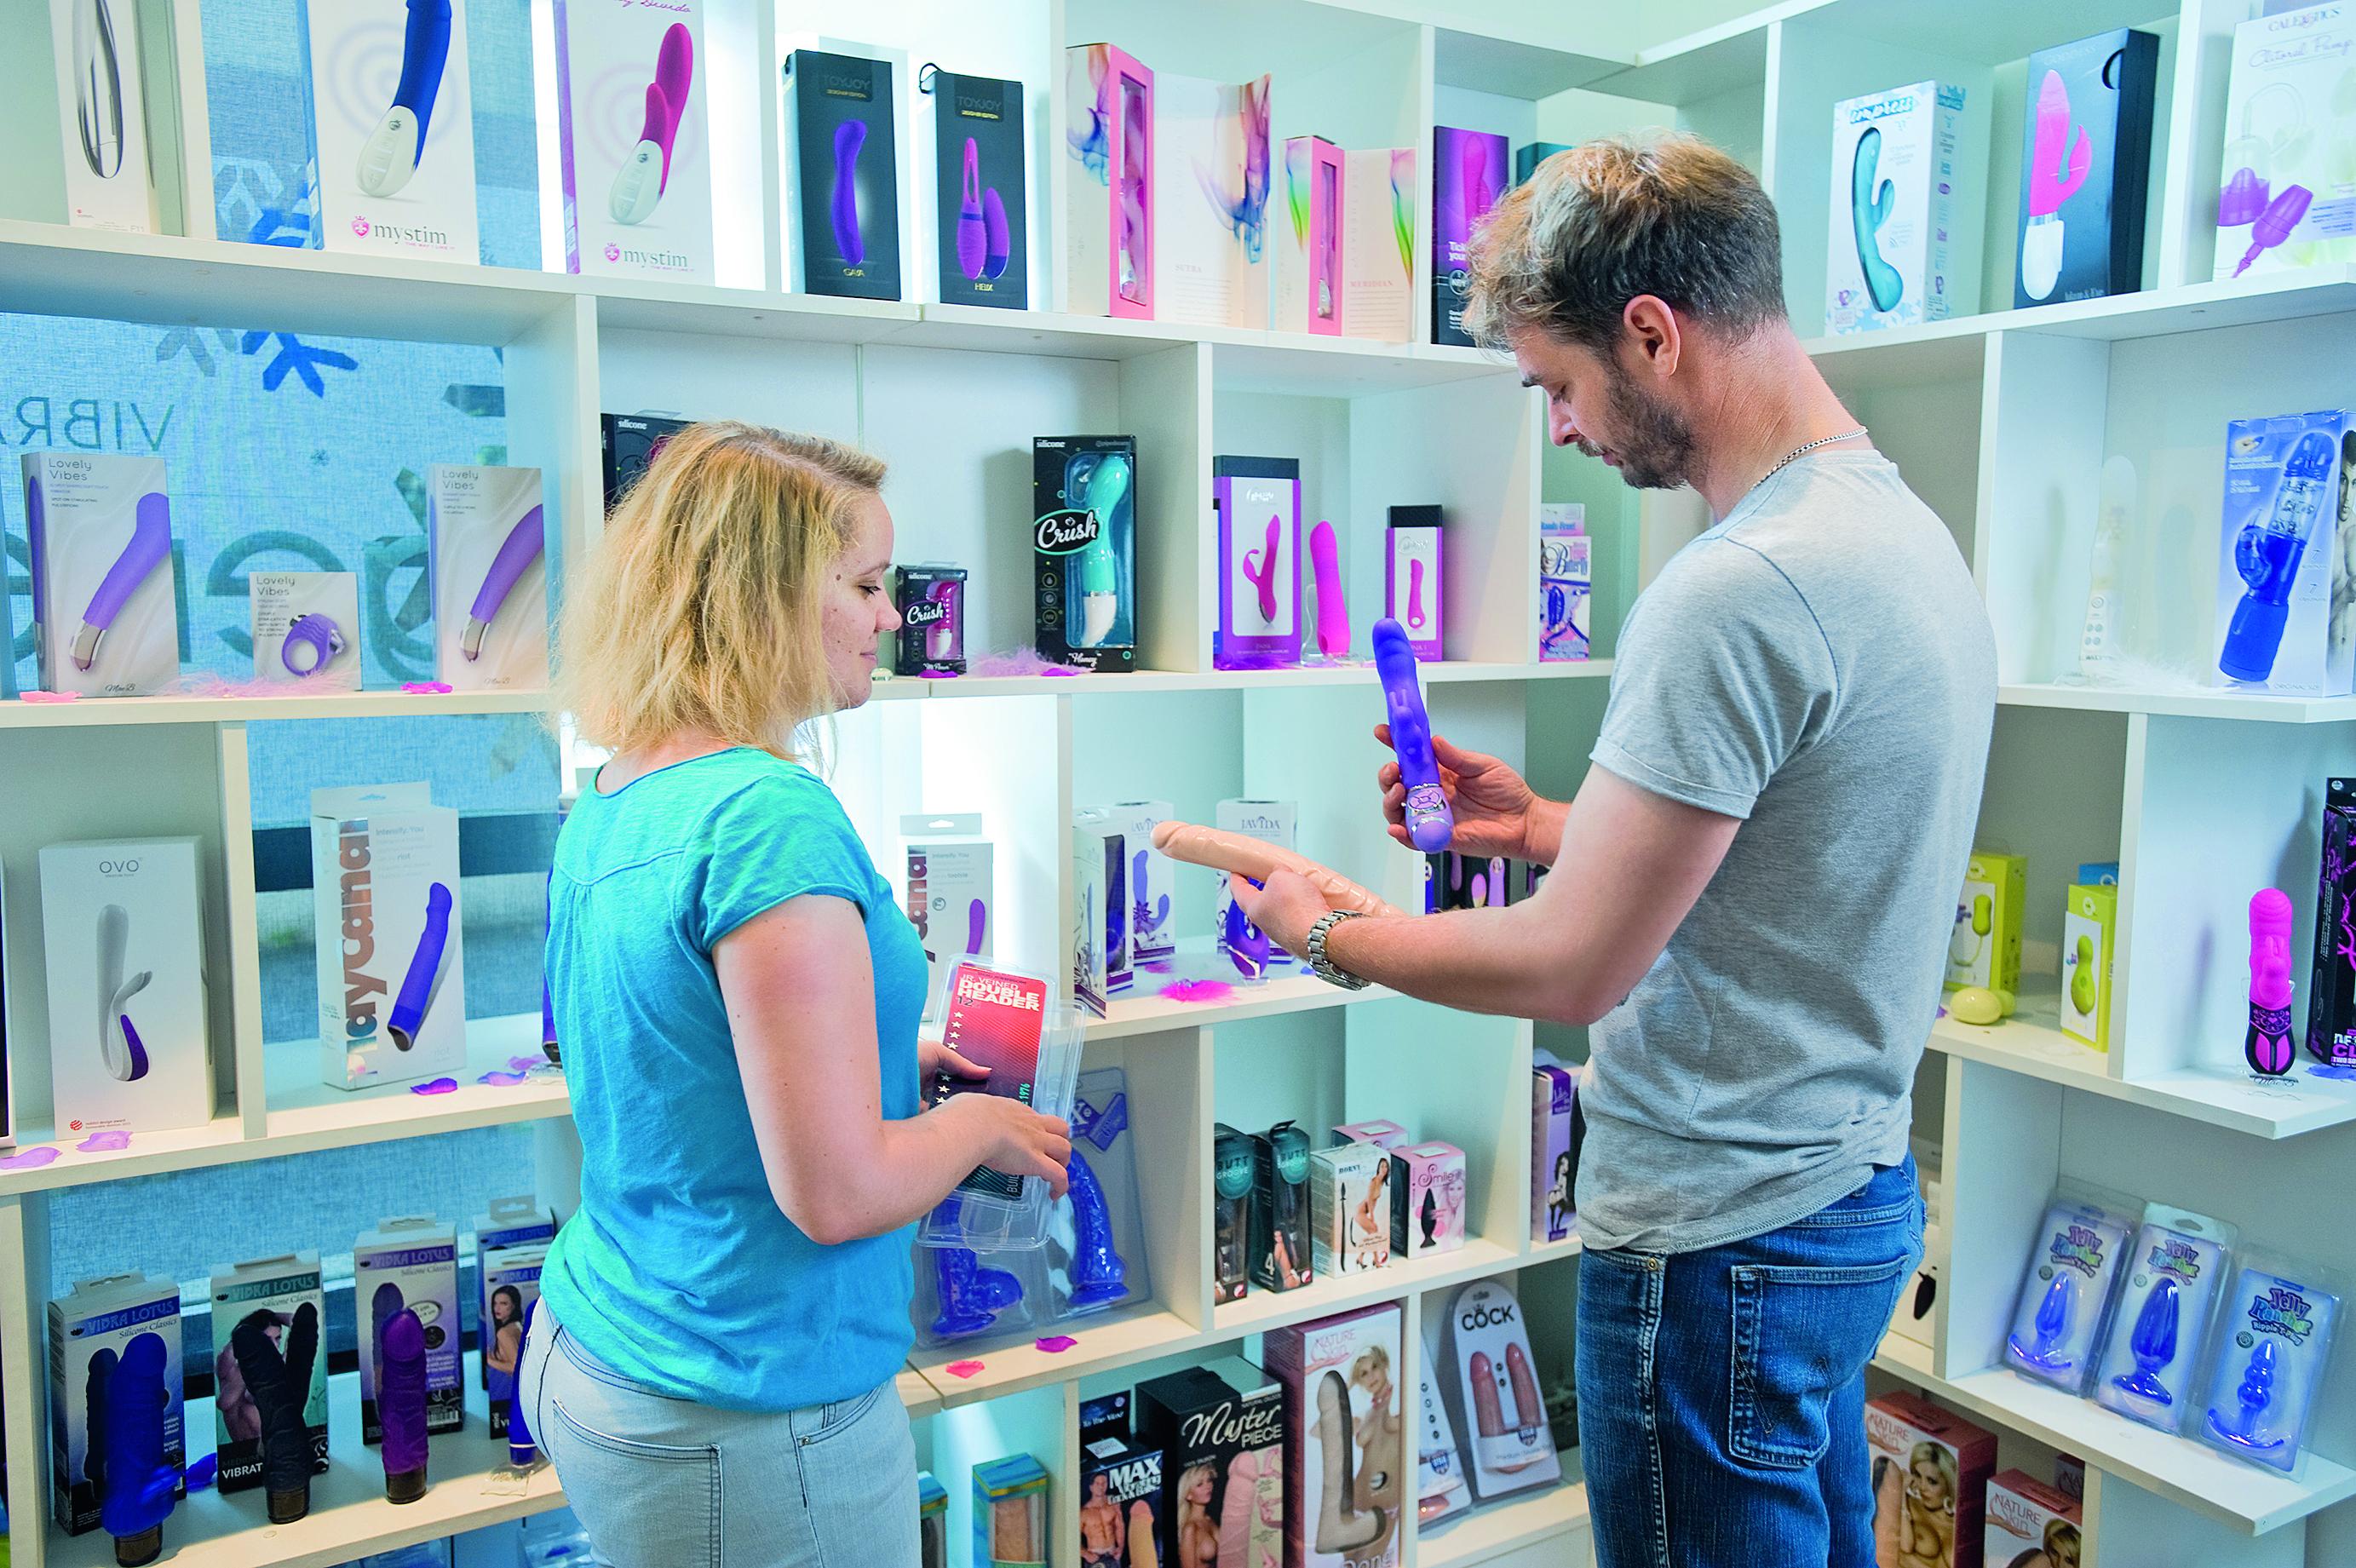 Shop centar sex zagreb Sex shop